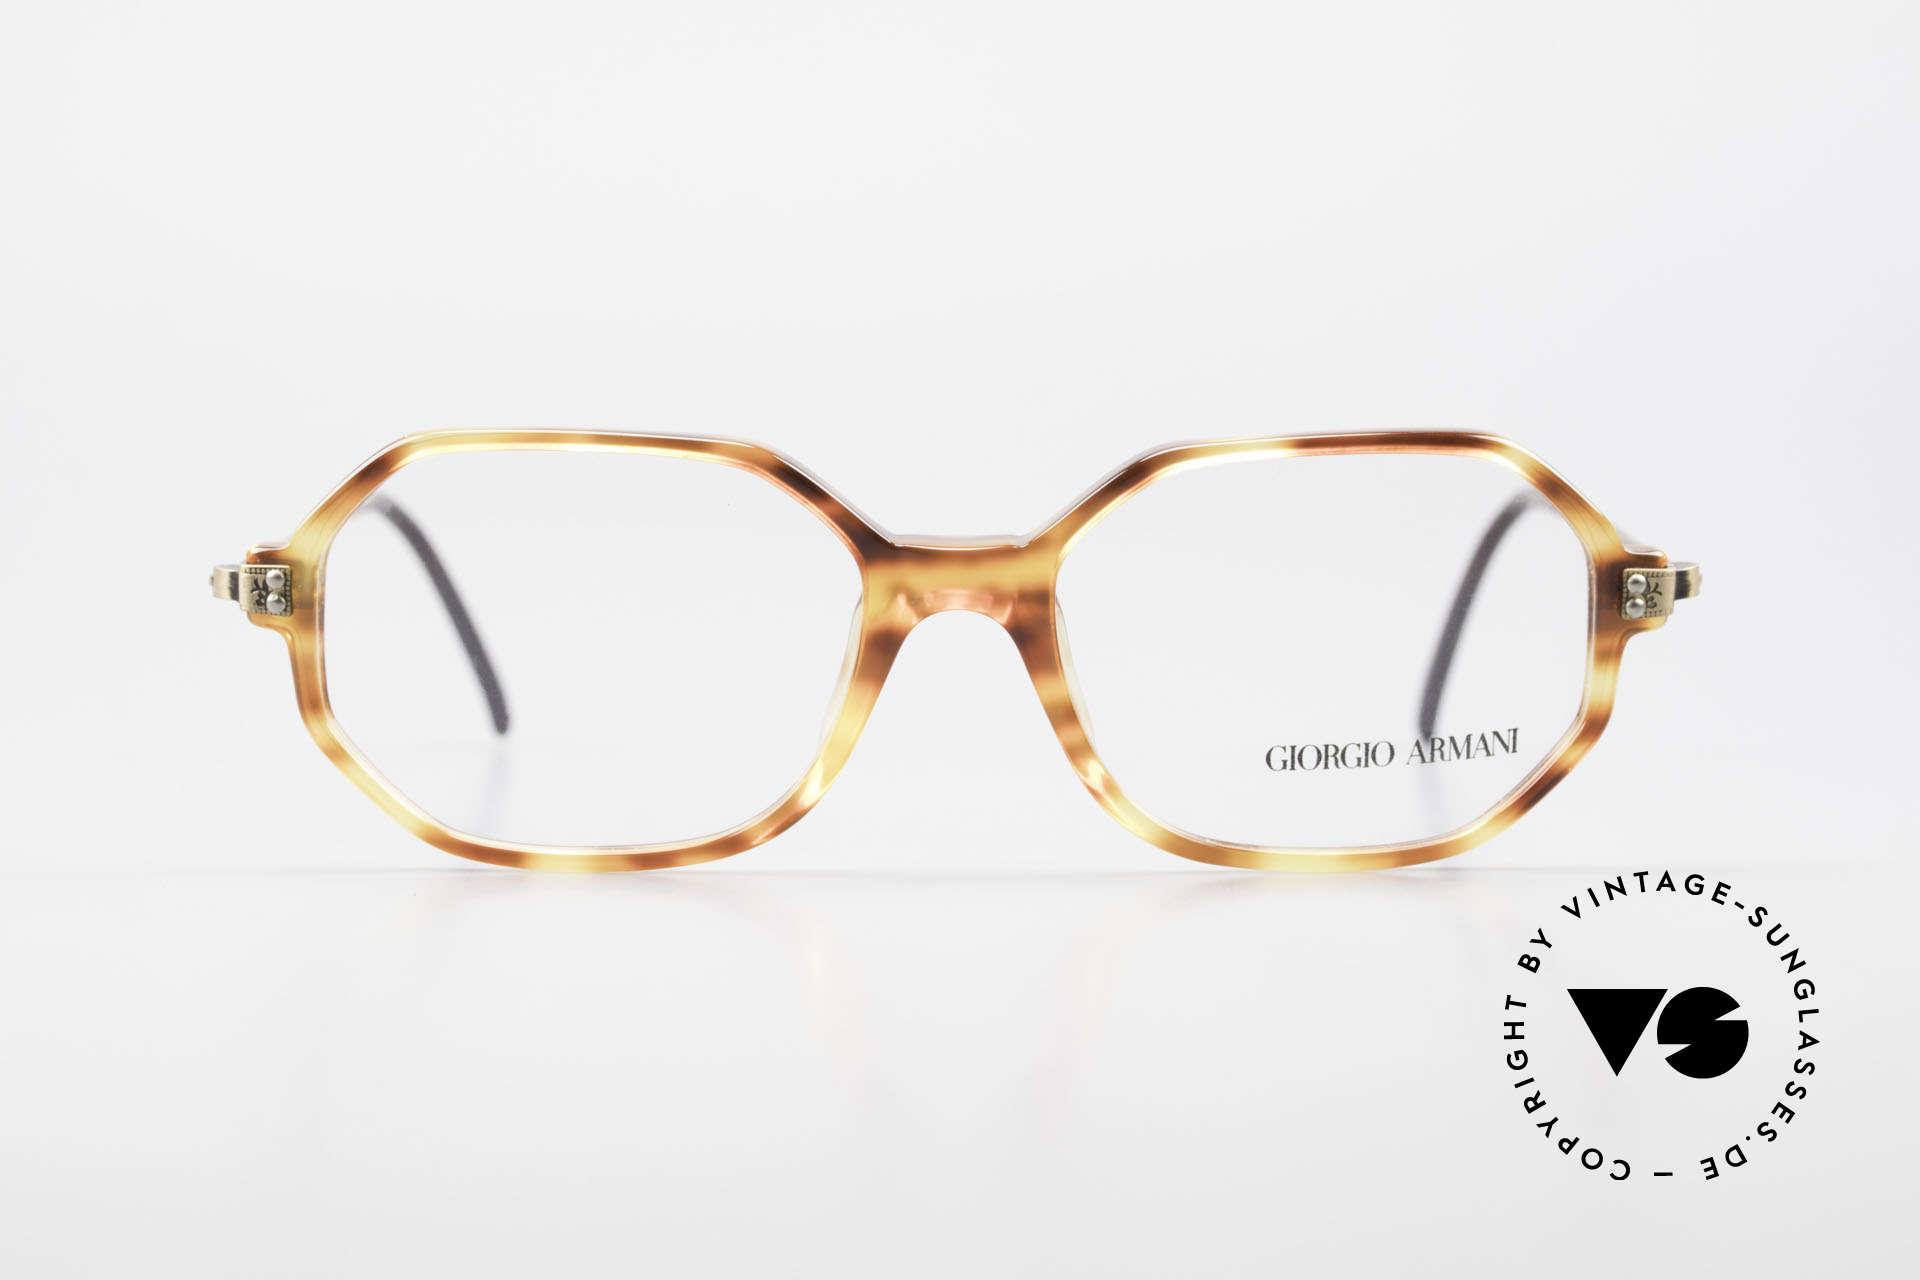 Giorgio Armani 349 No Retro Glasses Vintage Frame, octagonal GIORGIO Armani vintage eyeglasses, Made for Men and Women